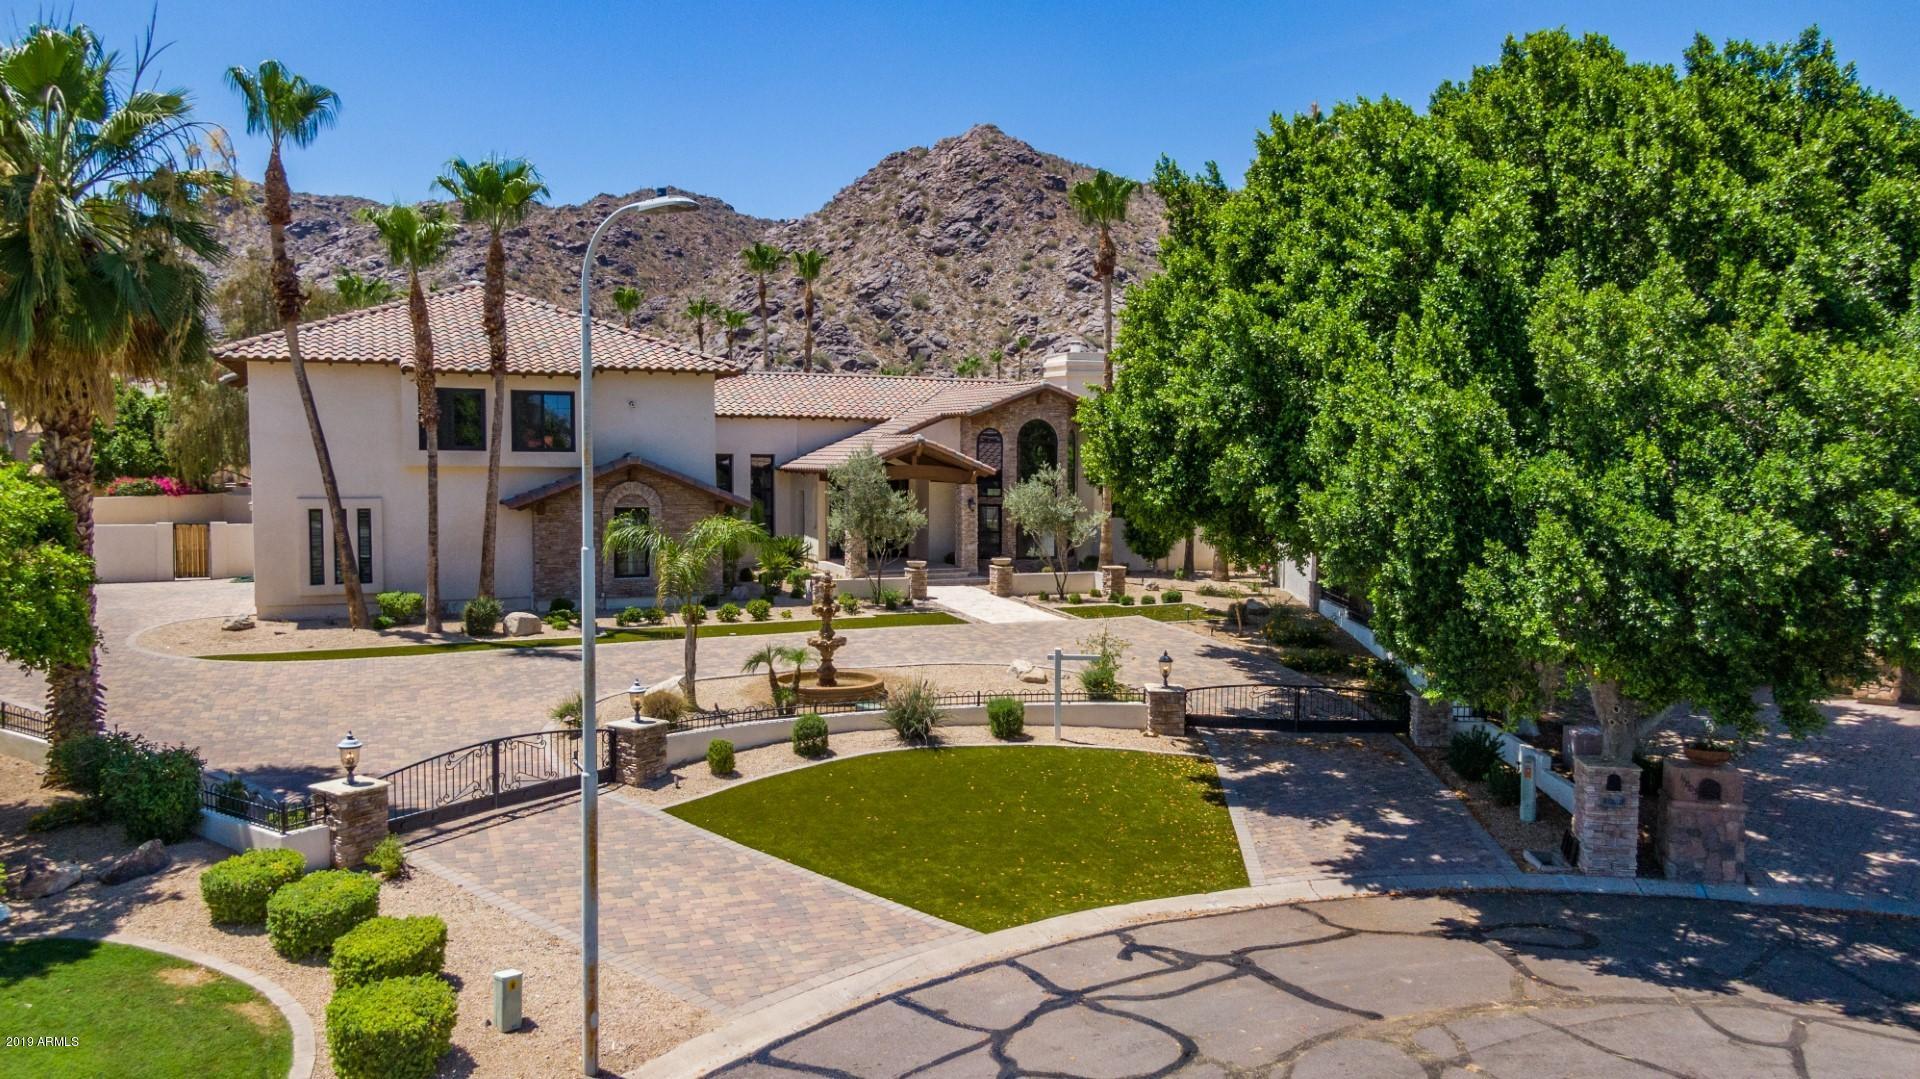 Photo of 11808 S TUZIGOOT Court, Phoenix, AZ 85044